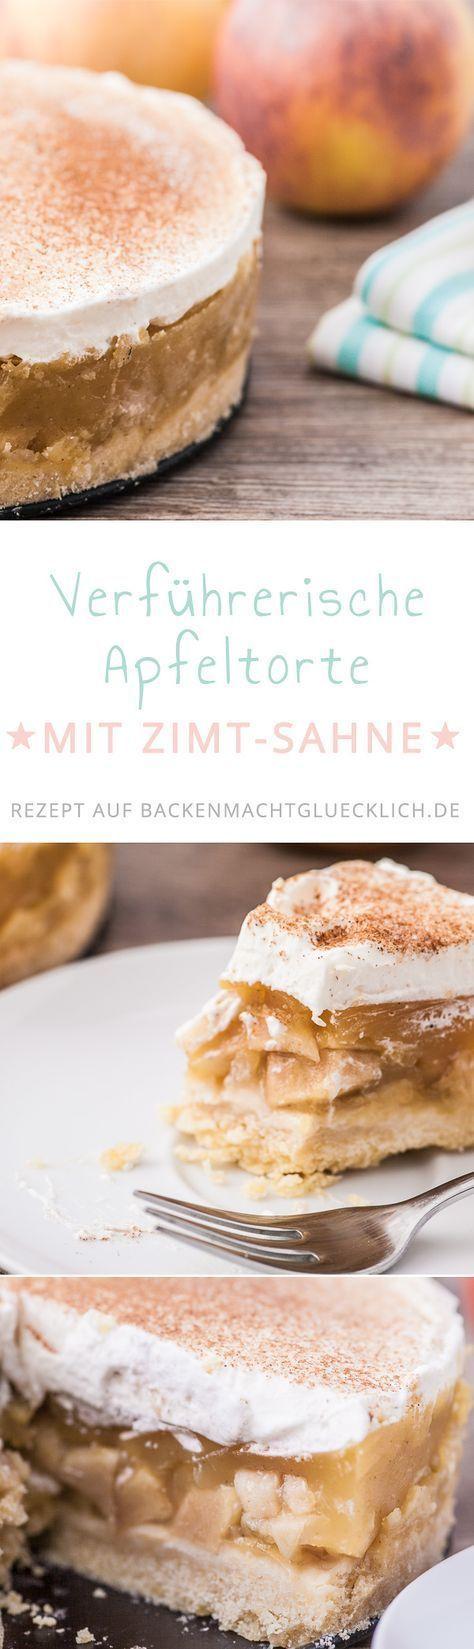 Apfel-Sahne-Torte mit Pudding #blog